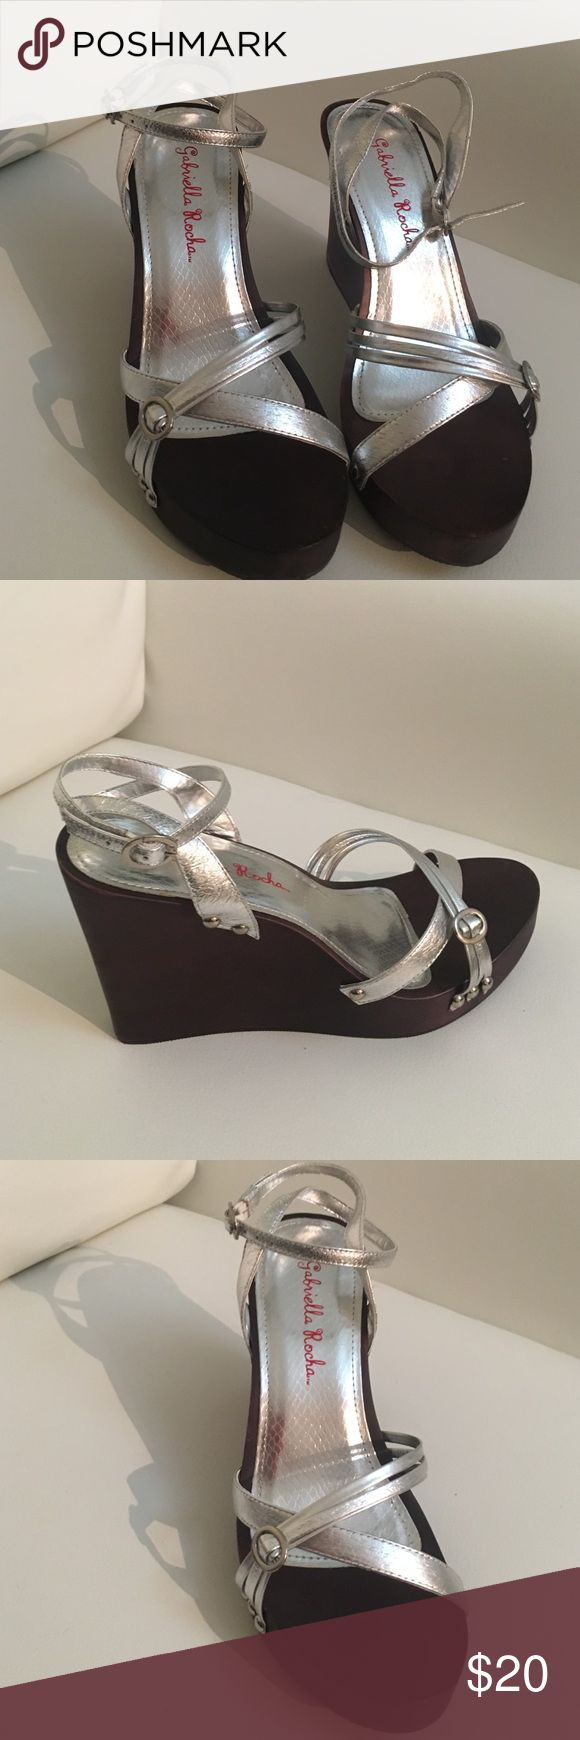 Gabriella Rocha Silver Wedge Sandal. Brand new, still in box. Box is slightly dirty that's about it! 😊 Gabriella Rocha Shoes Wedges